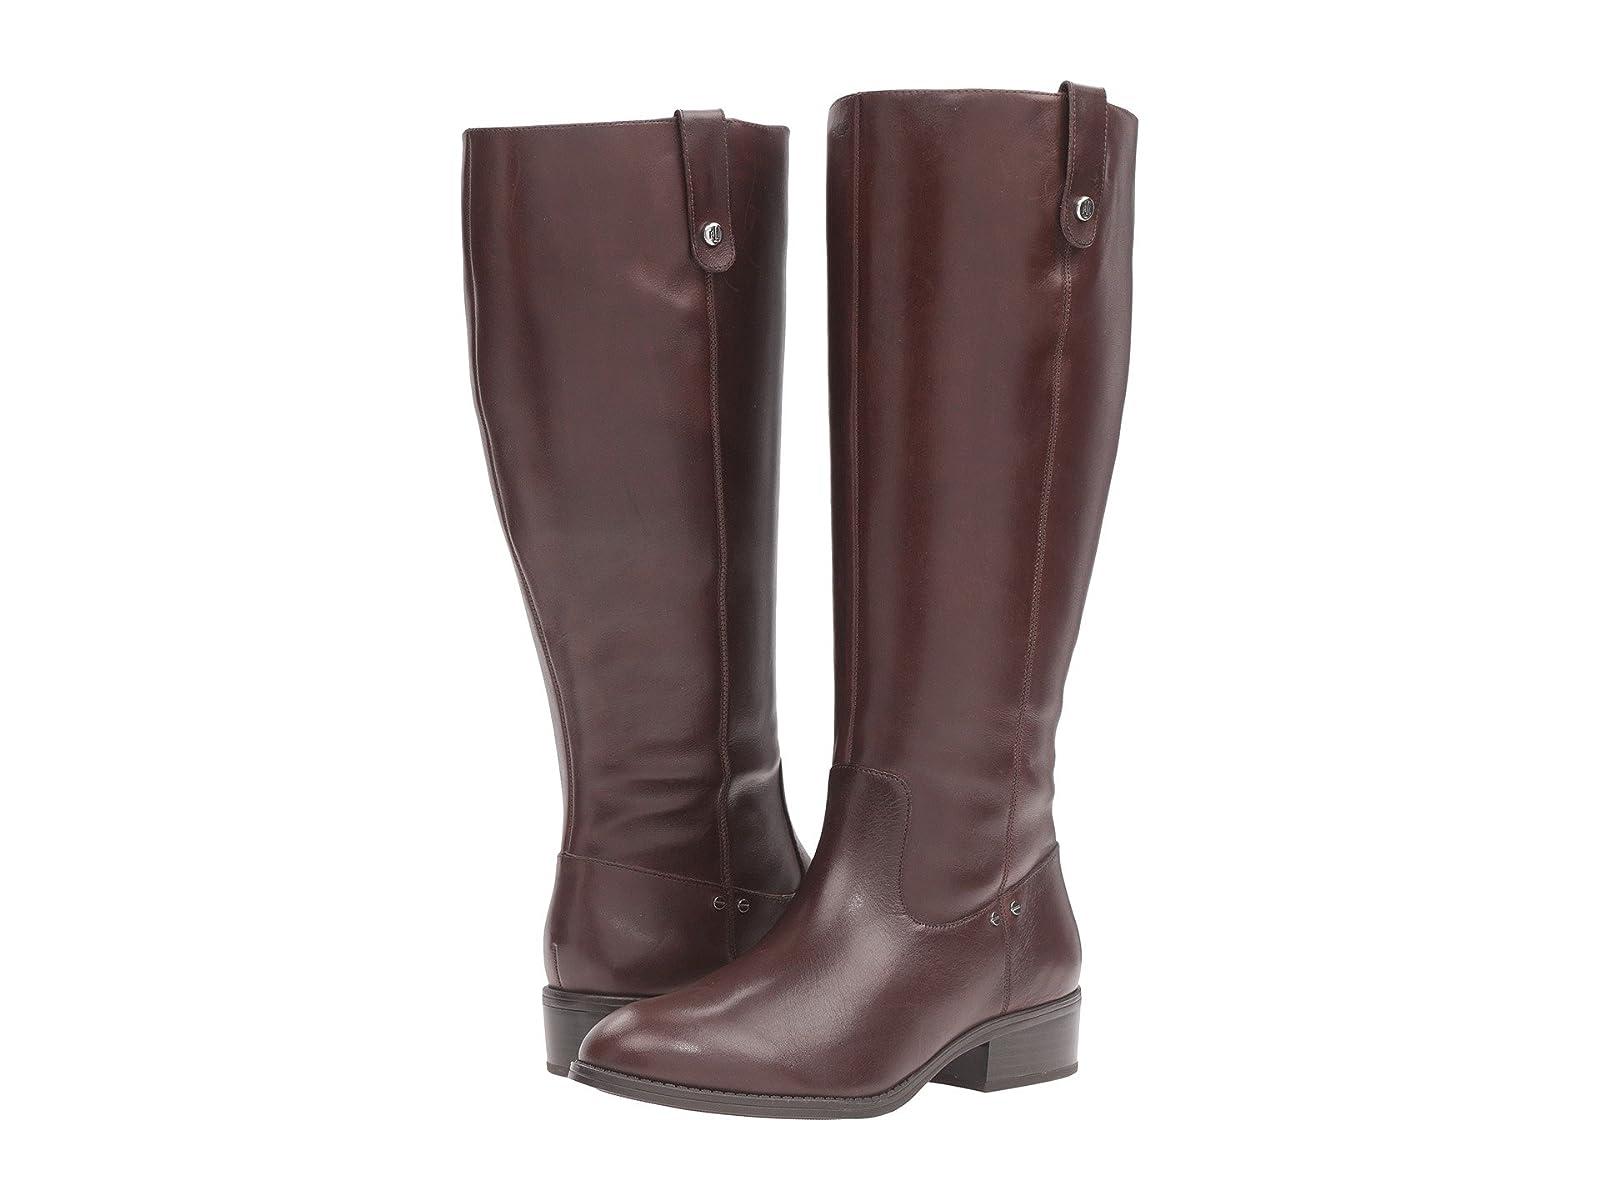 LAUREN Ralph Lauren Masika Wide CalfCheap and distinctive eye-catching shoes